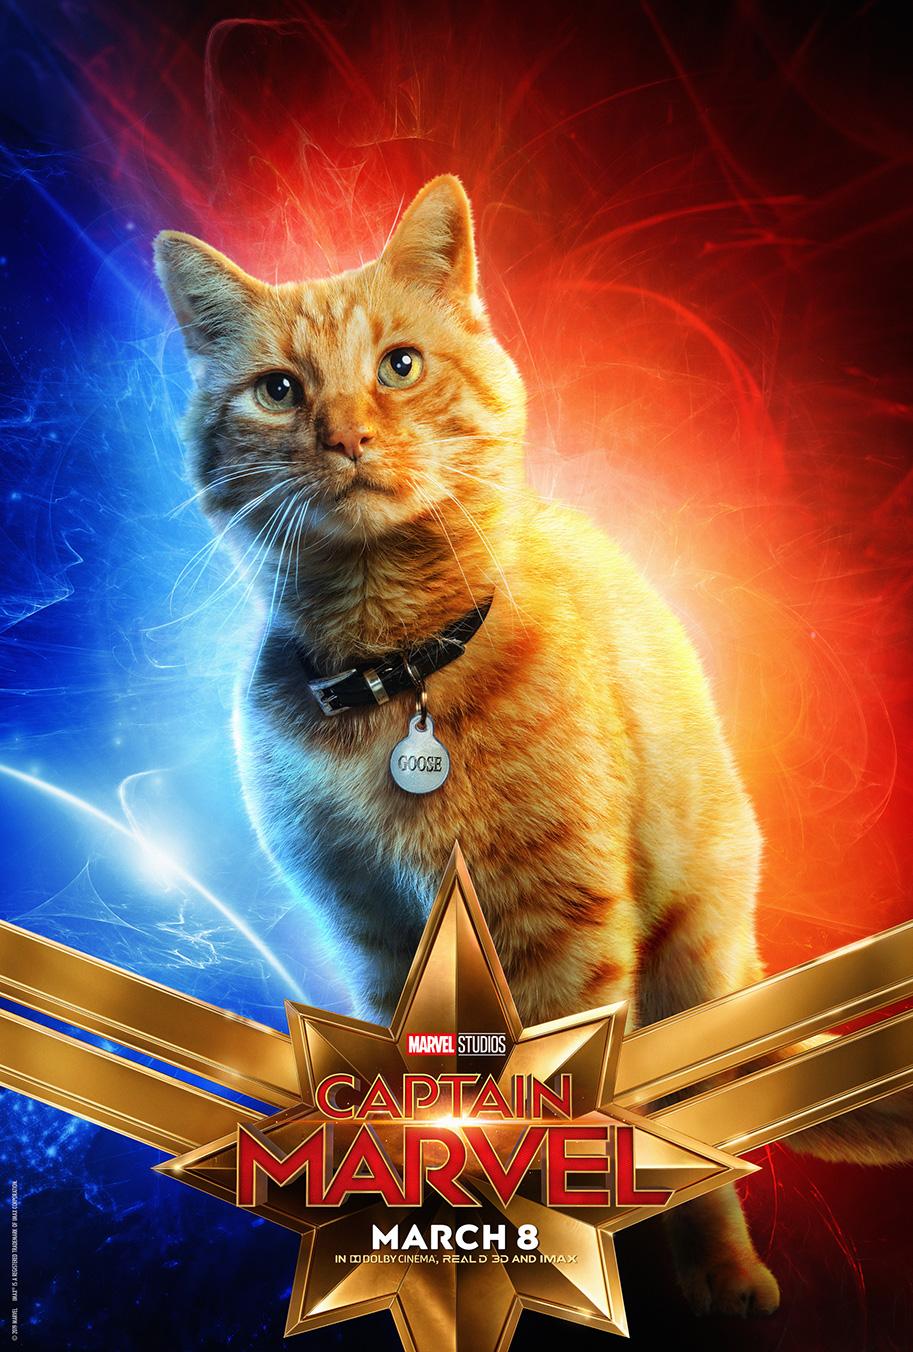 goose the cat, carol's adorable feline friend